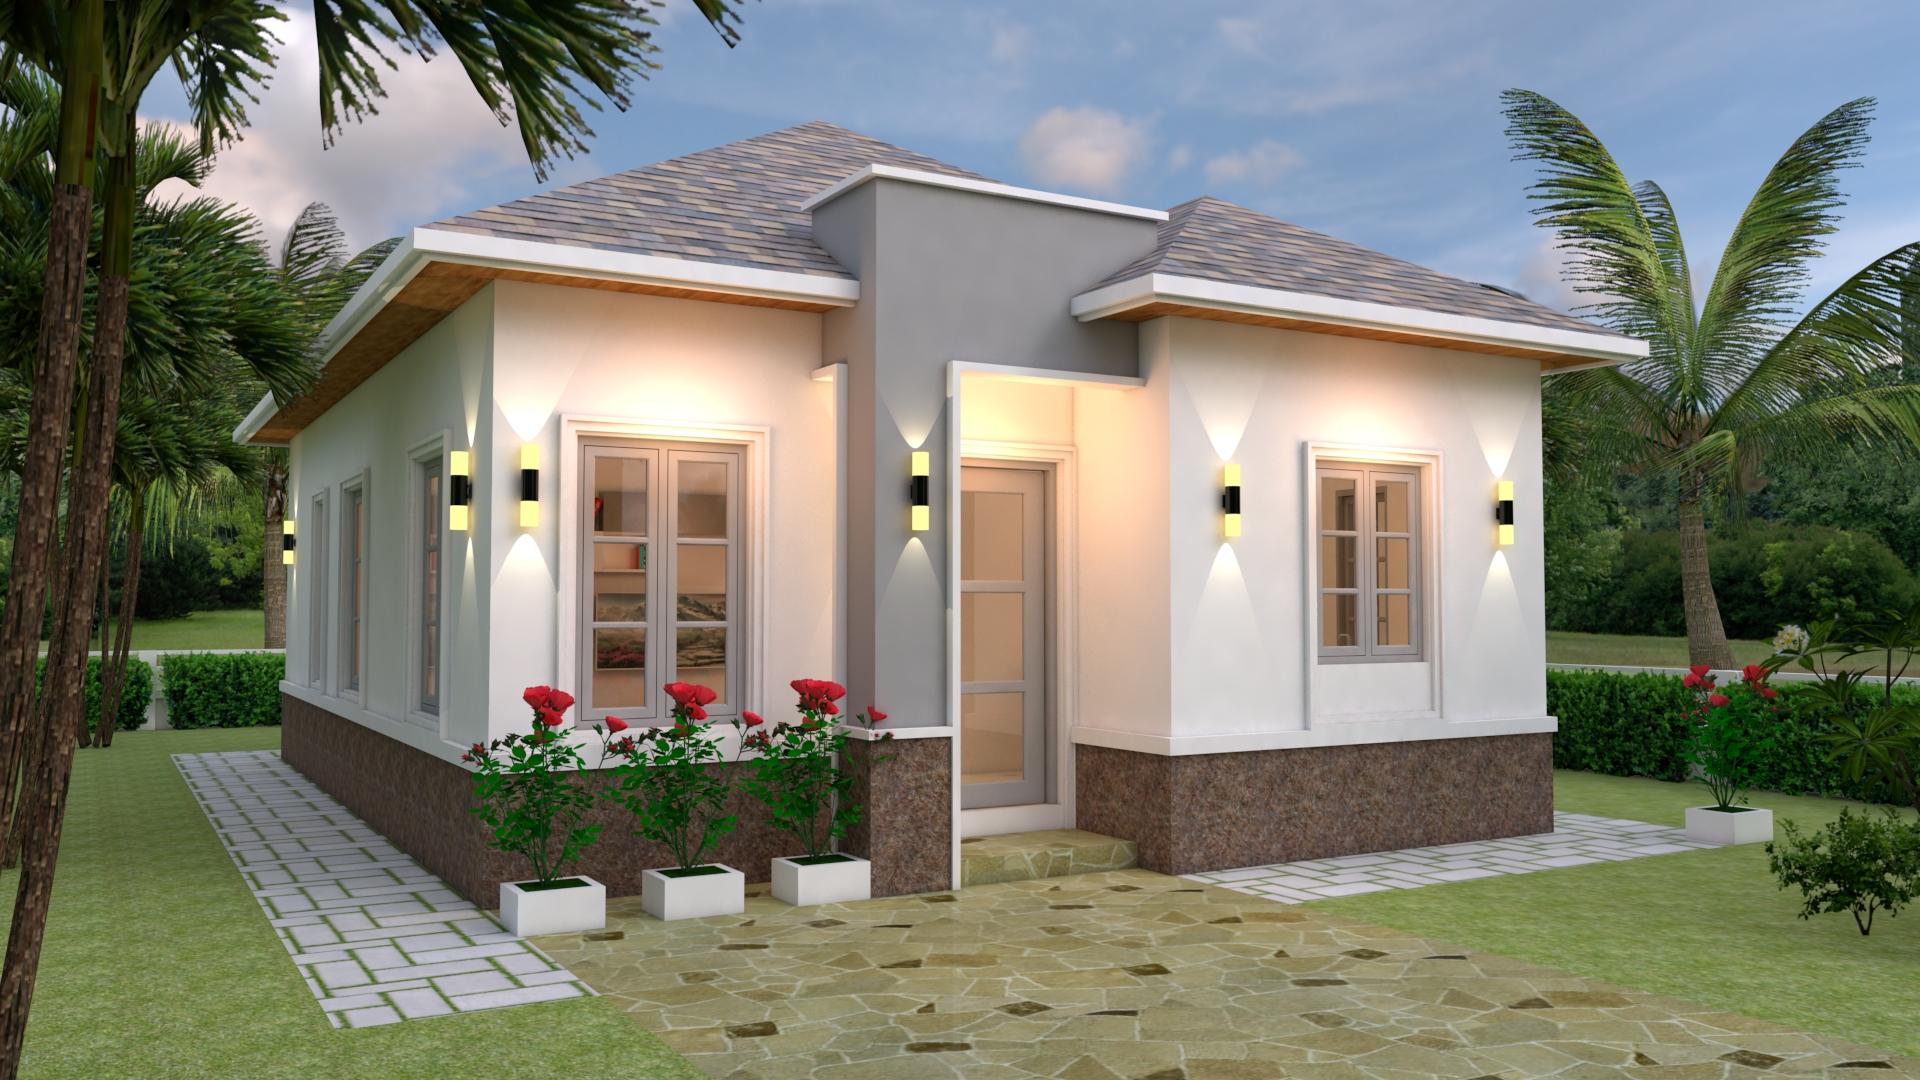 Home Assessment Foundation